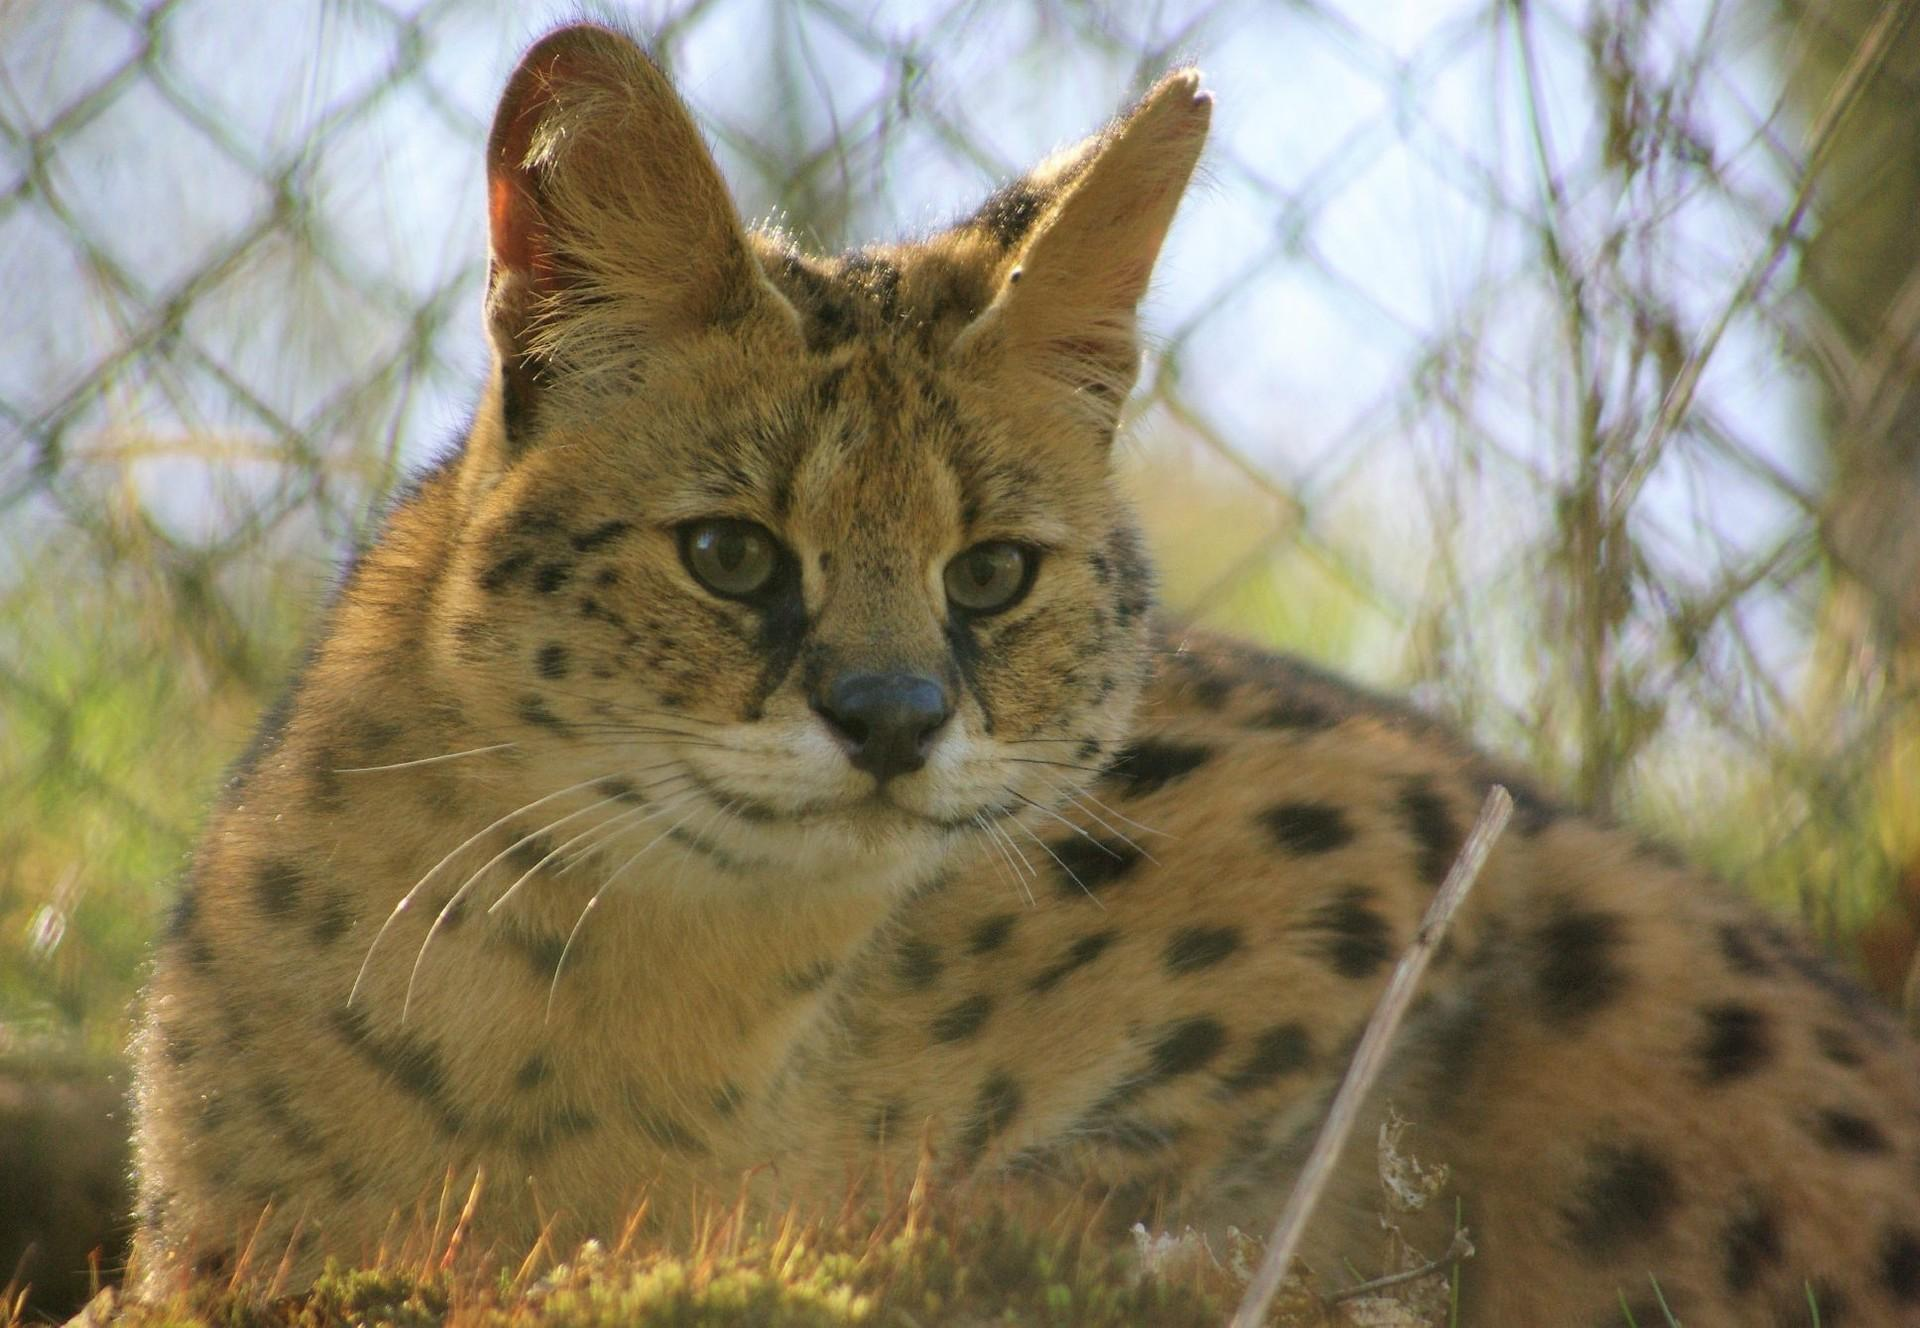 Kiano the serval